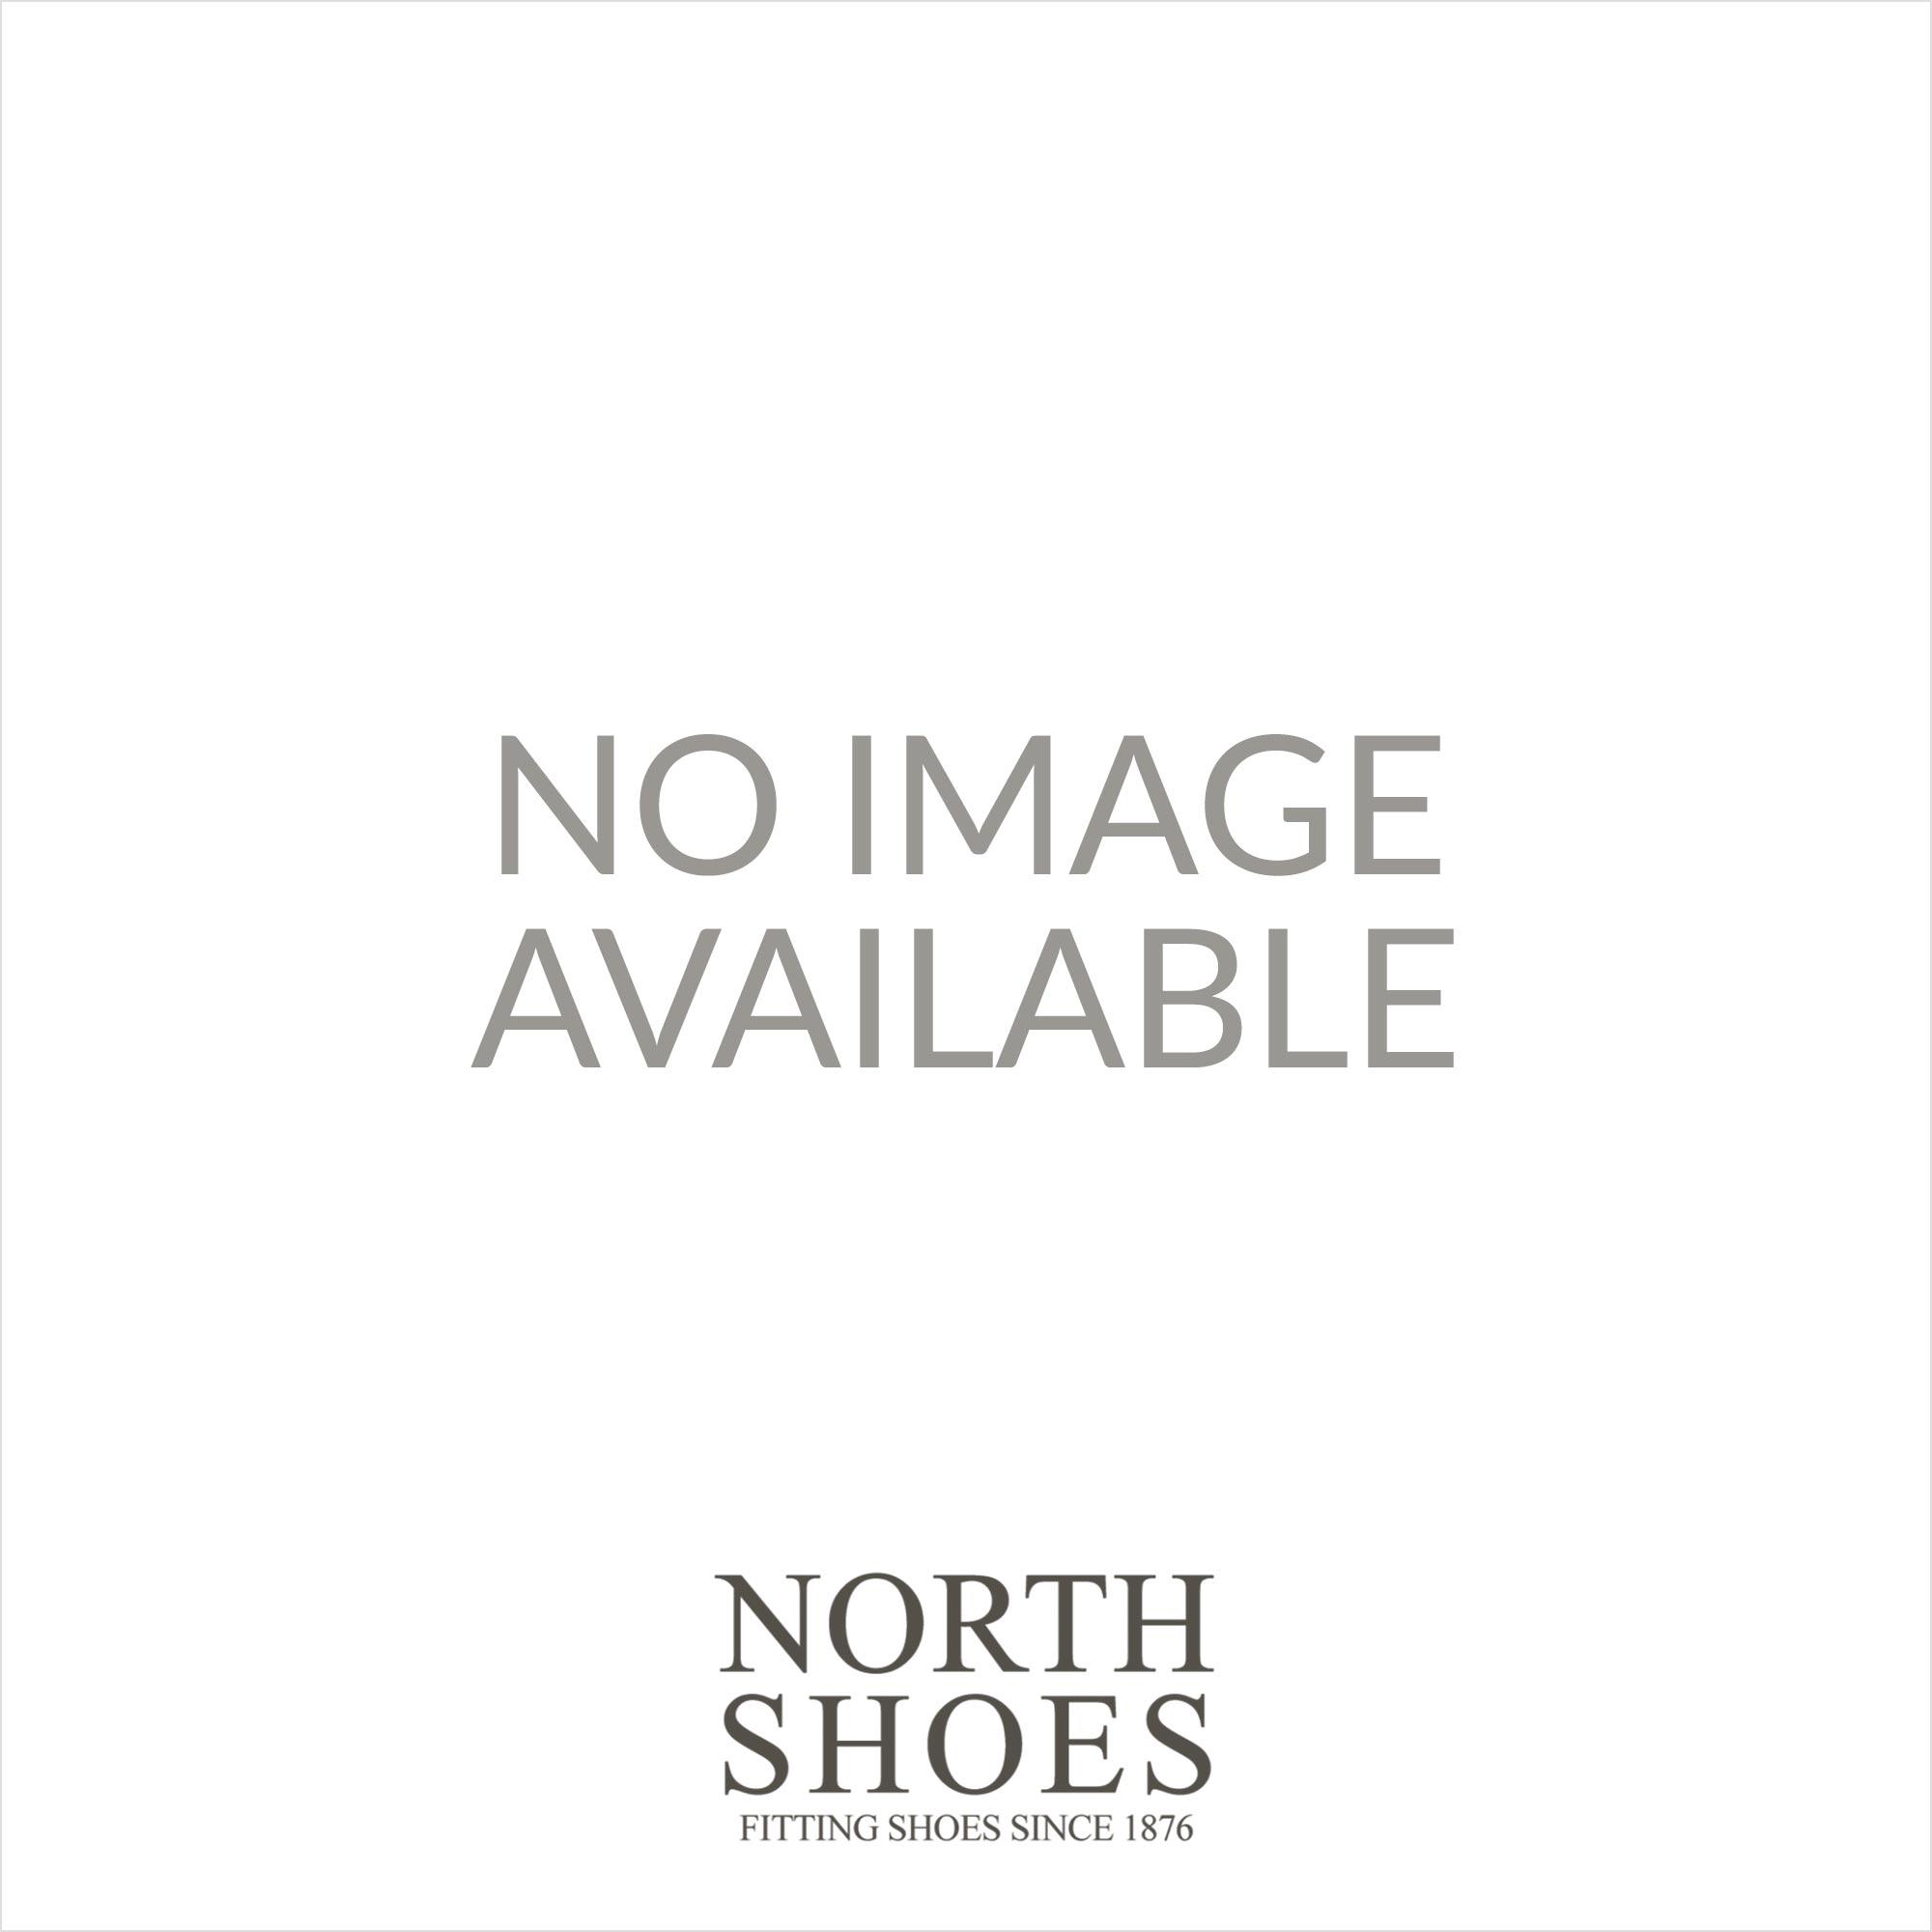 7a678cd0cd14 ... Rieker 59090-00 Black Nubuck Leather Womens Heeled Chelsea Boots ...